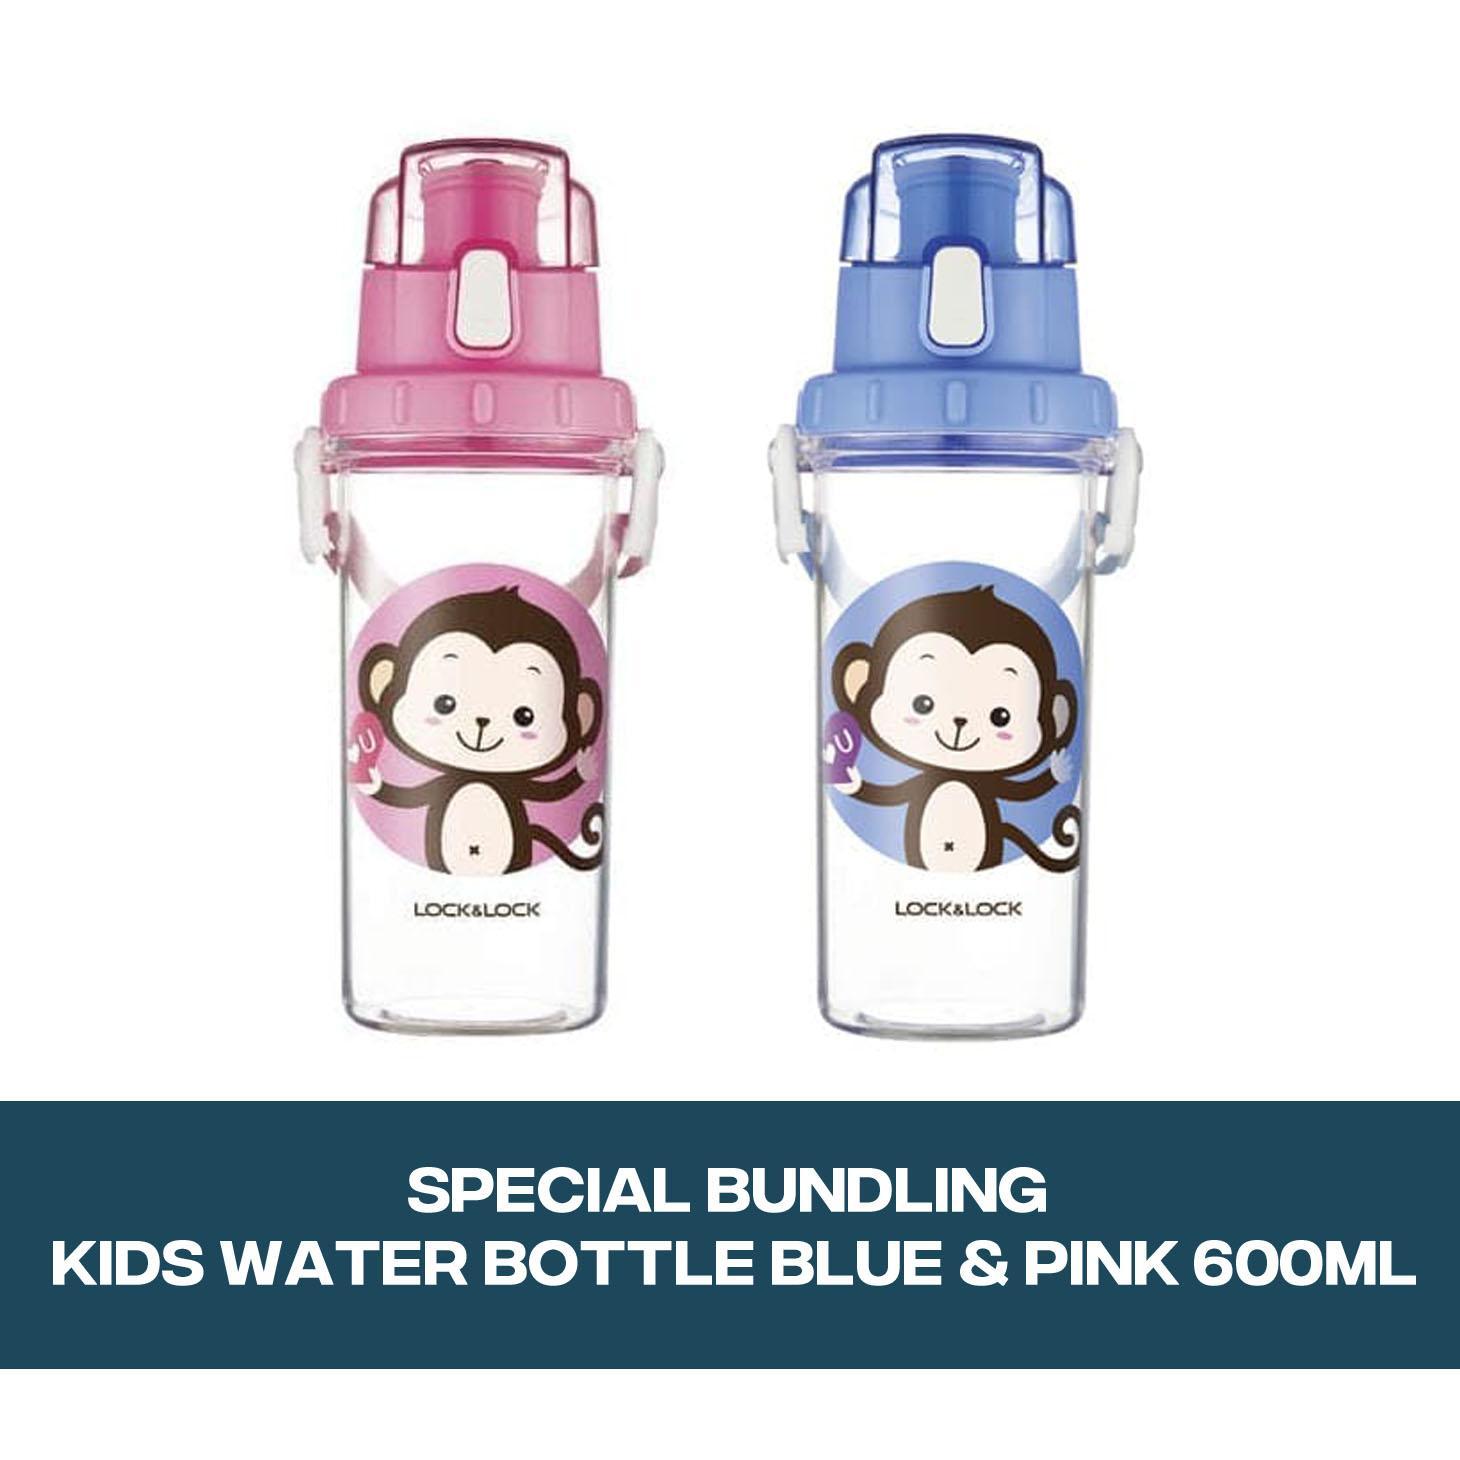 Lock&Lock Special Bundling Kids Water Bottle Blue & Pink 600ML